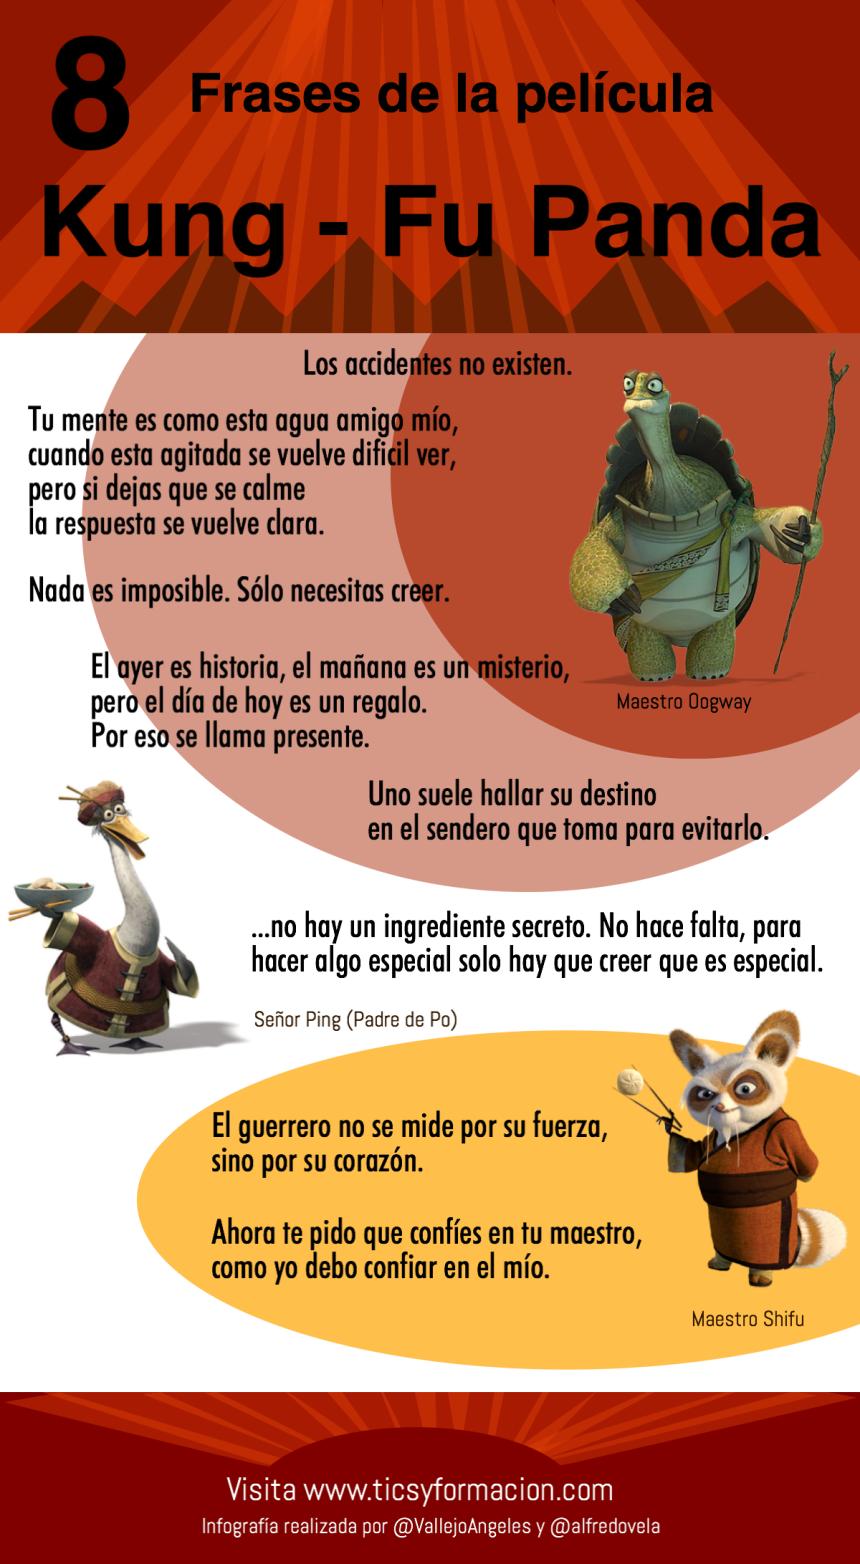 8 Frases De Las Película Kung Fu Panda Infografia